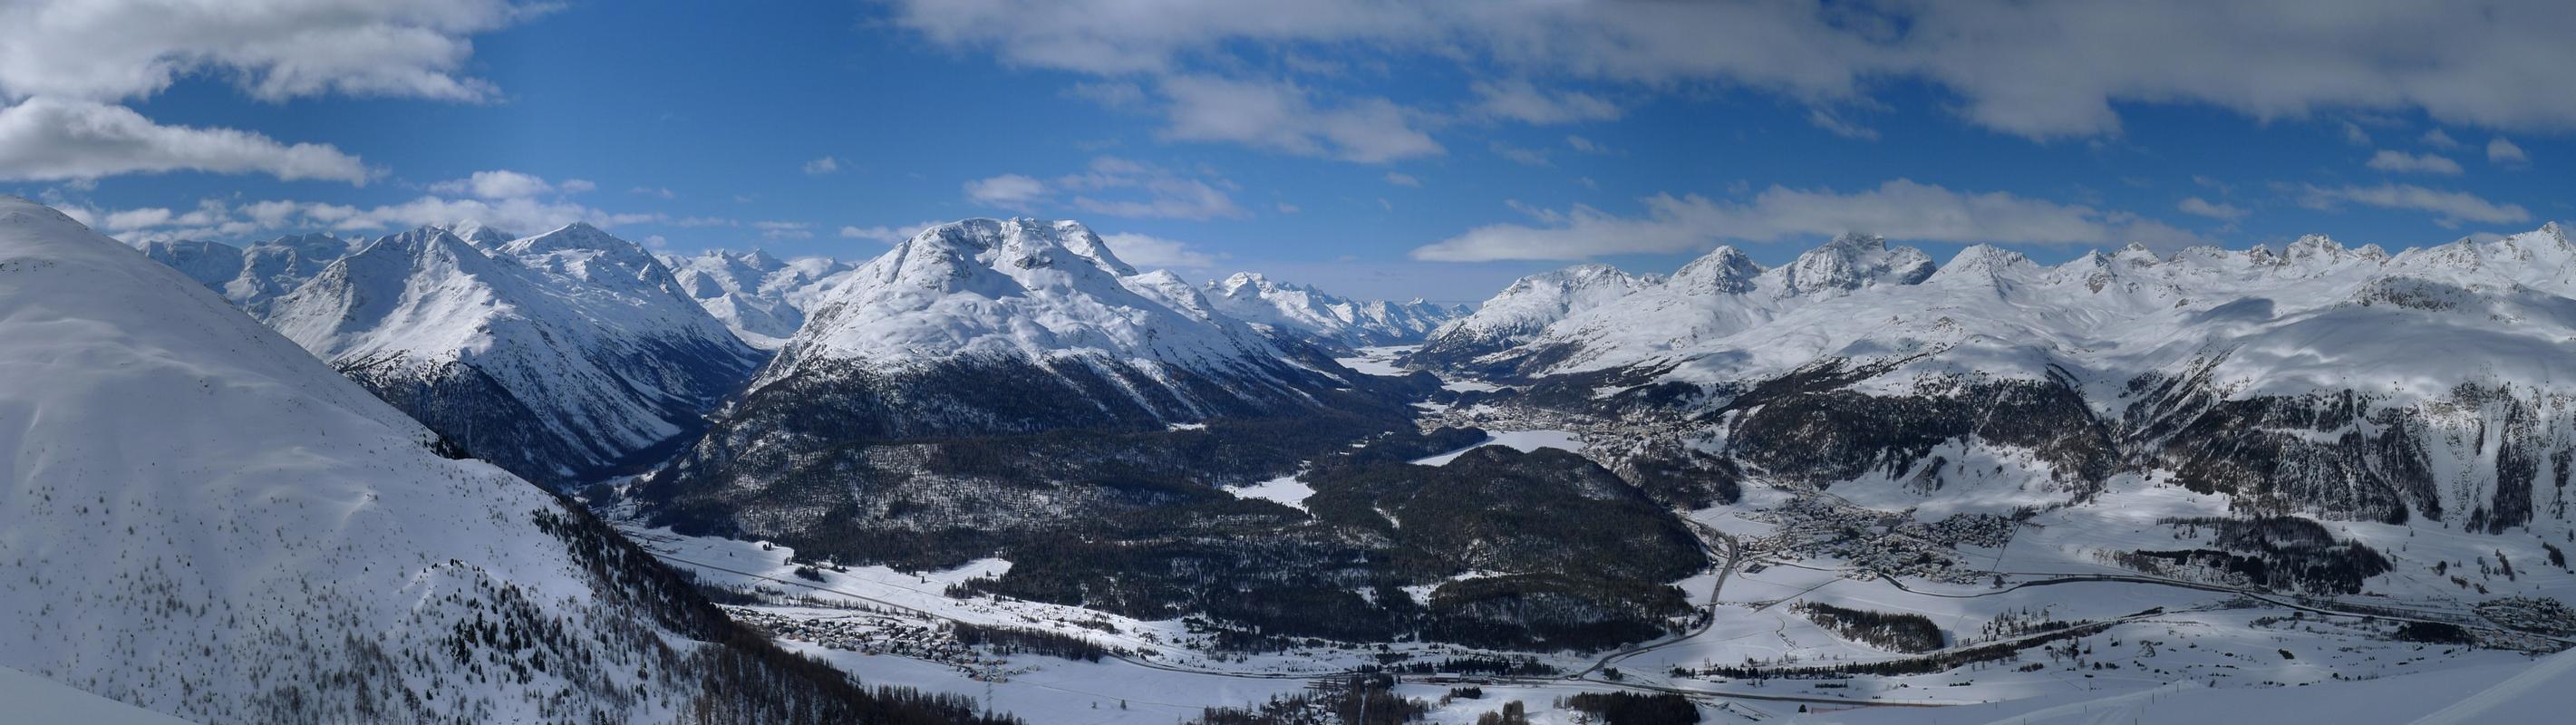 Piz Muragl Albula Alpen Švýcarsko panorama 11